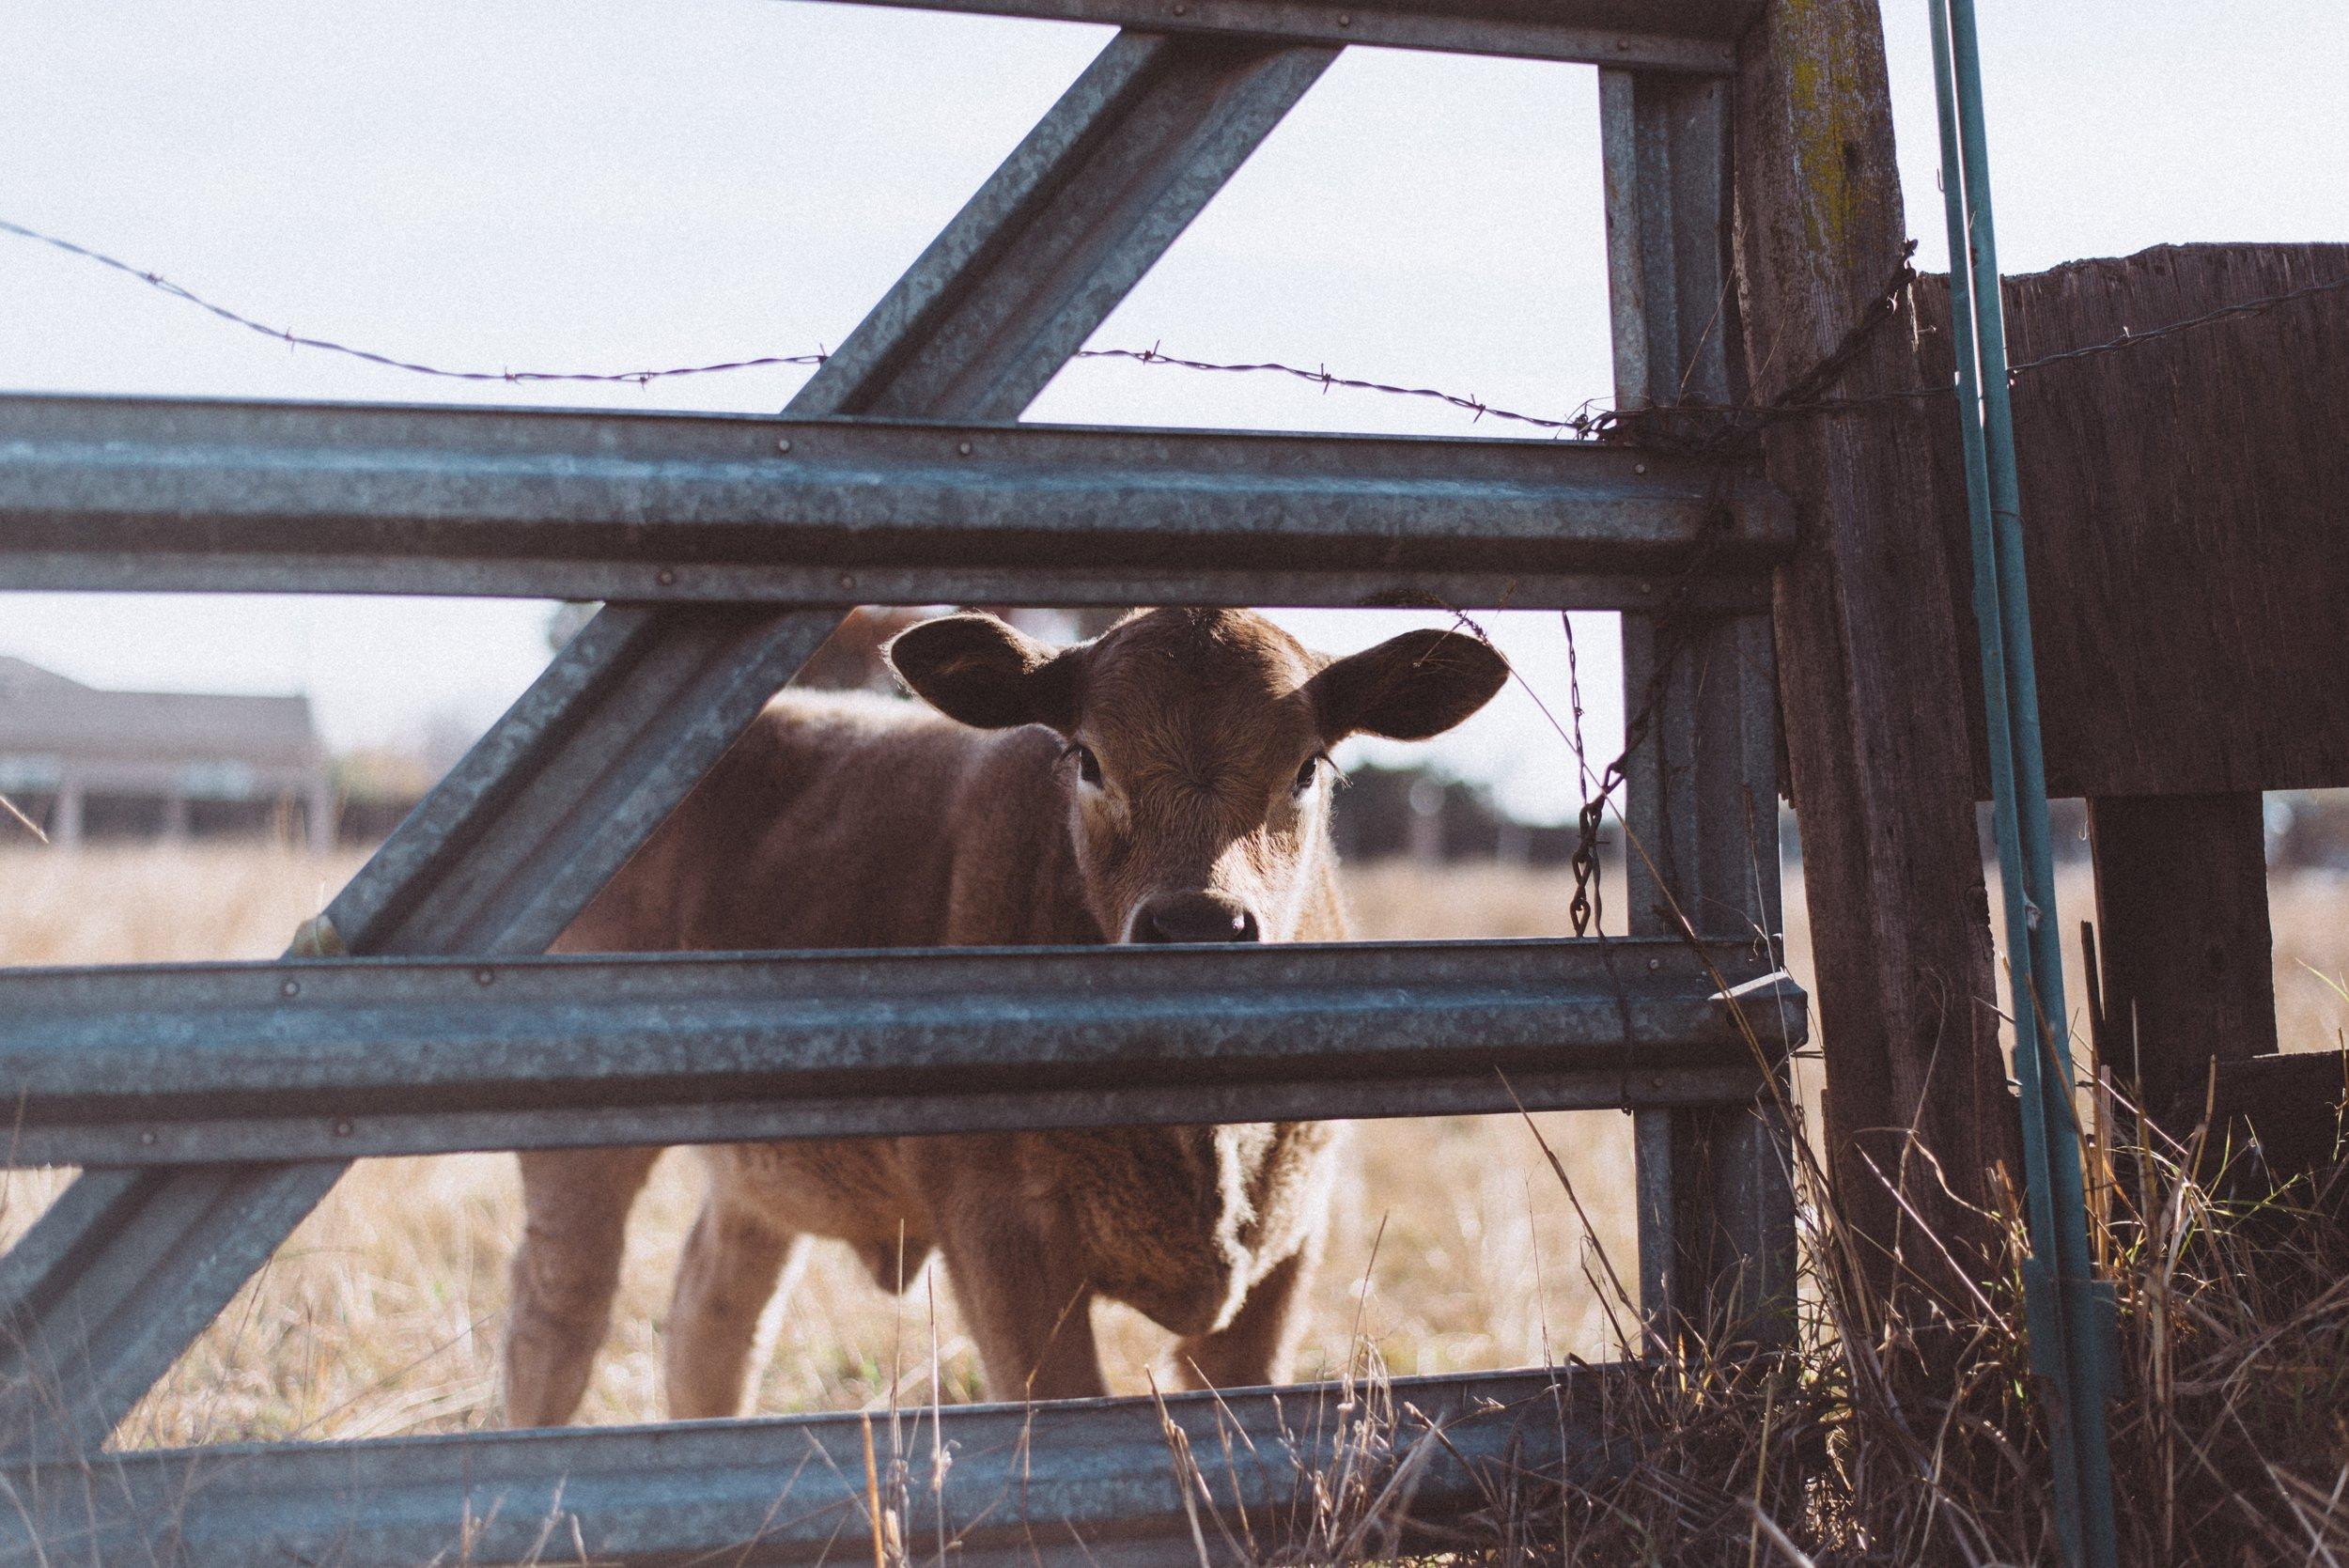 agriculture-animal-animal-farming-775418.jpg